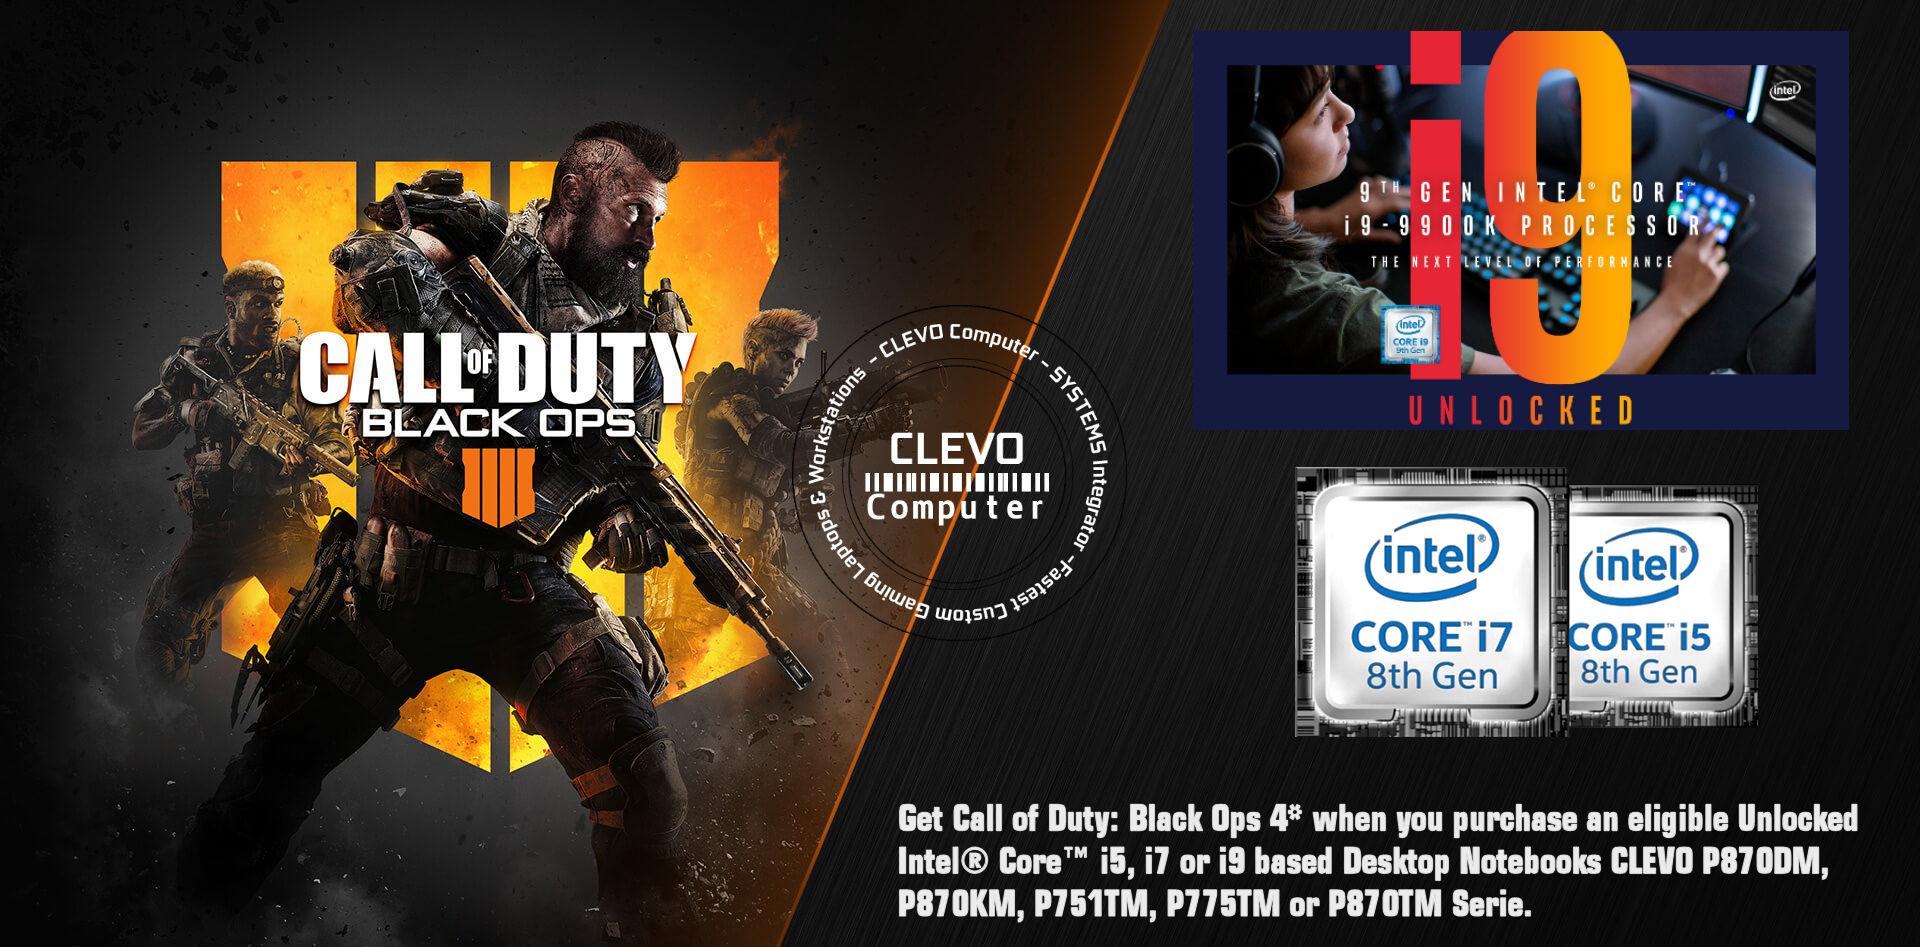 call-of-duty-black-ops-intel-bundle-unlocked-cpu-desktop-laptop-clevo-coffee-lake-gaming-notebooks-dtr